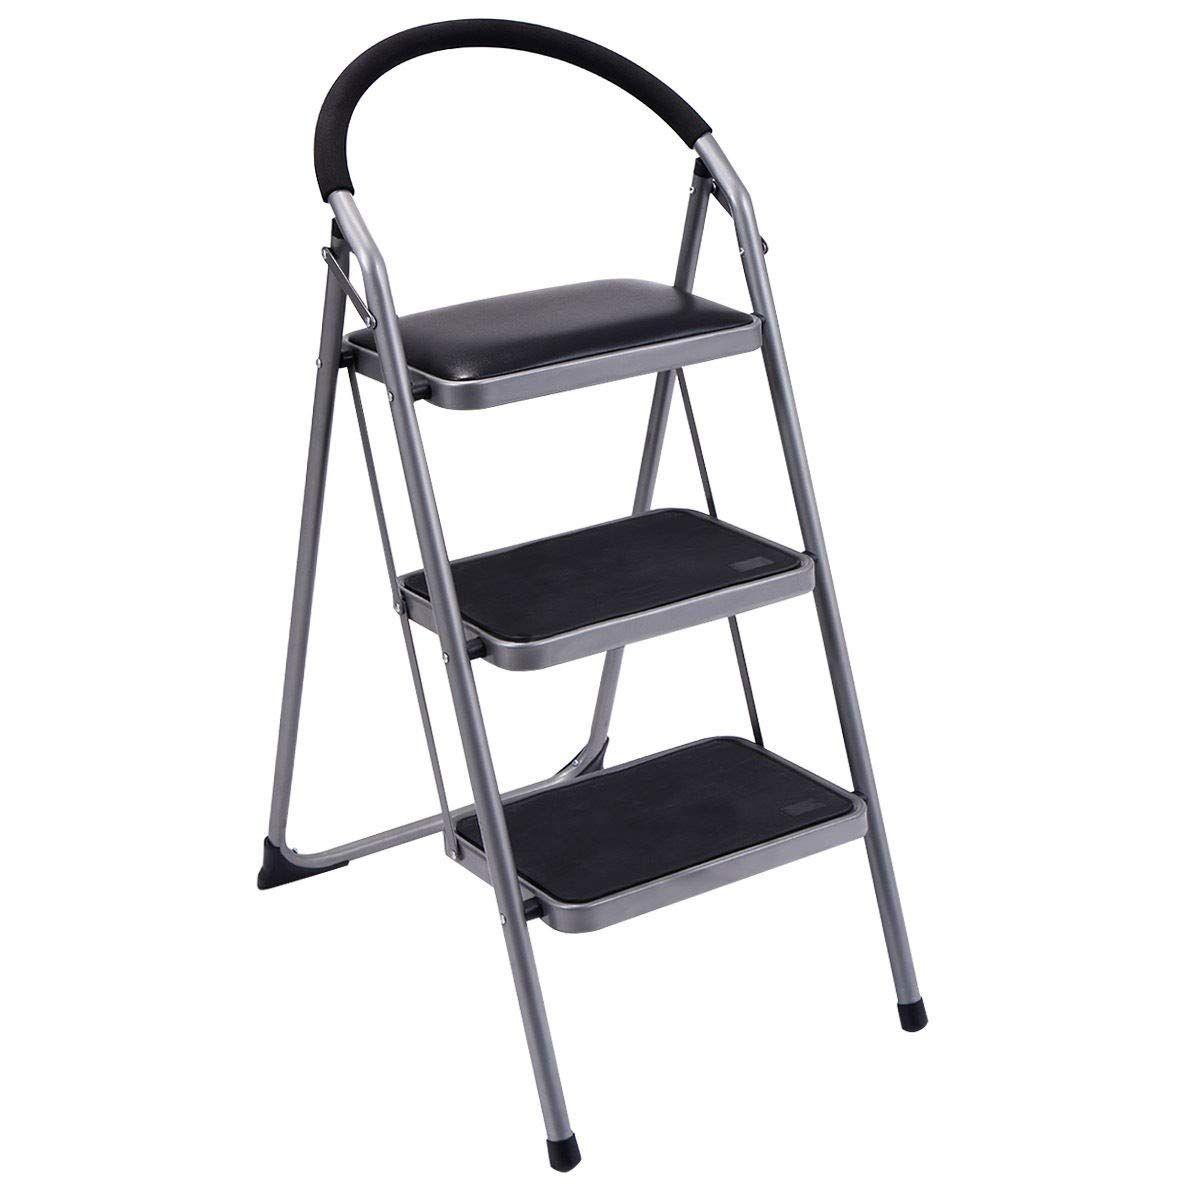 mrt supply lightweight folding stool heavy duty nonslip 3